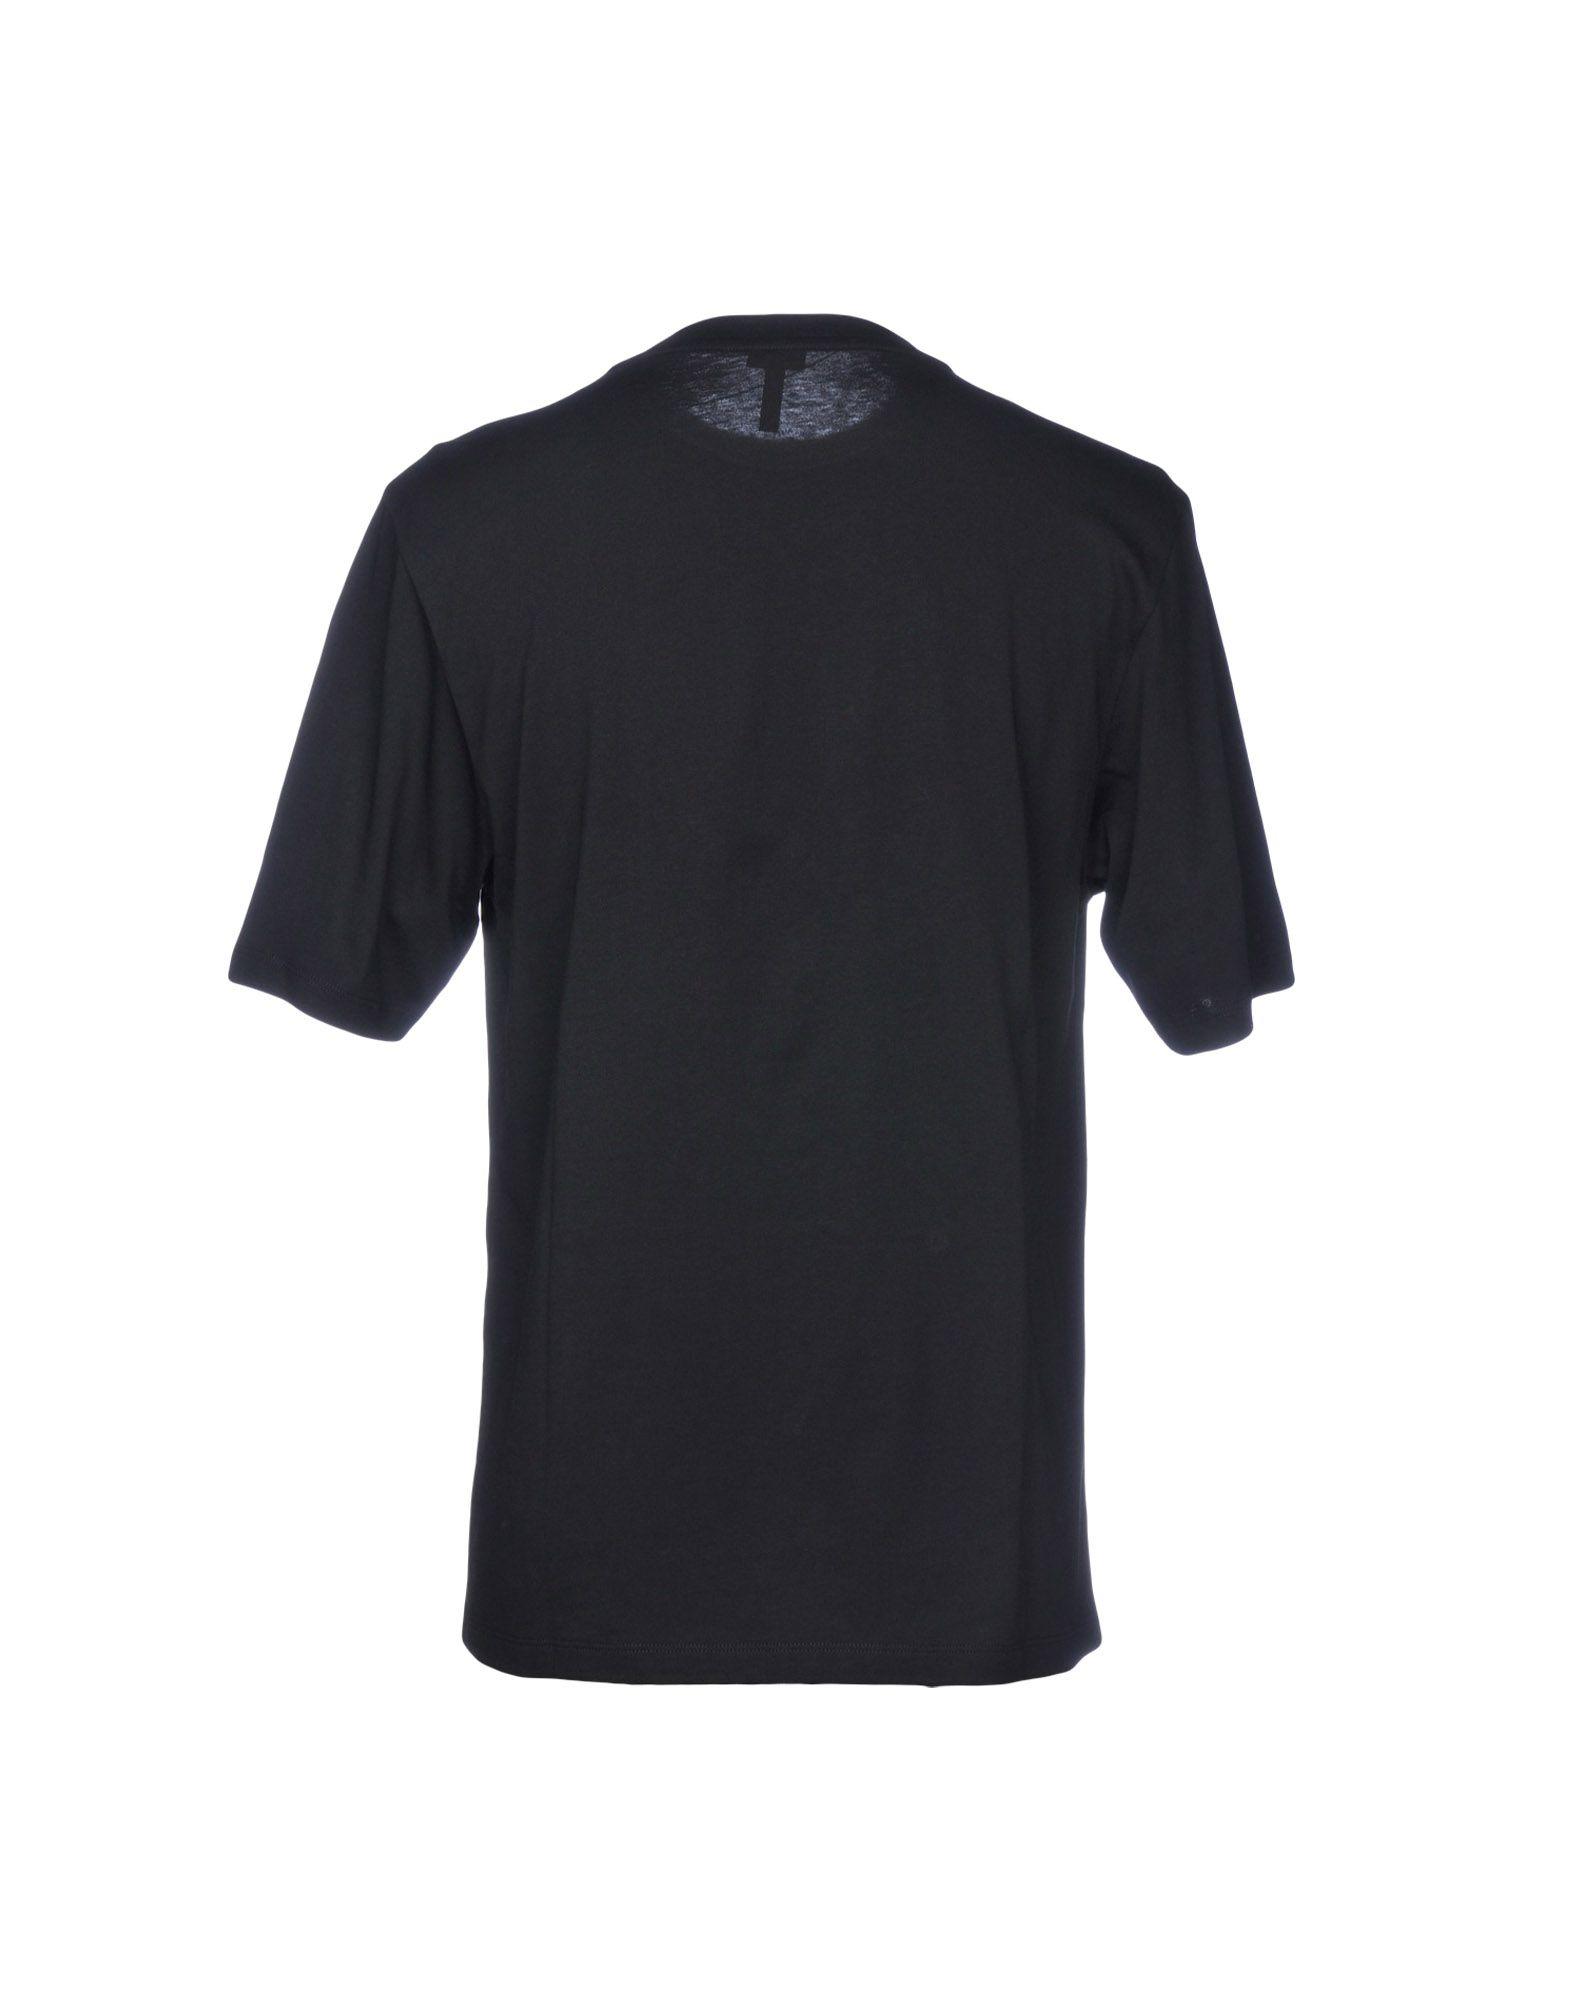 A buon mercato A buon mercato T-Shirt Loewe Uomo - 12188945BH 12188945BH - 0ae27b